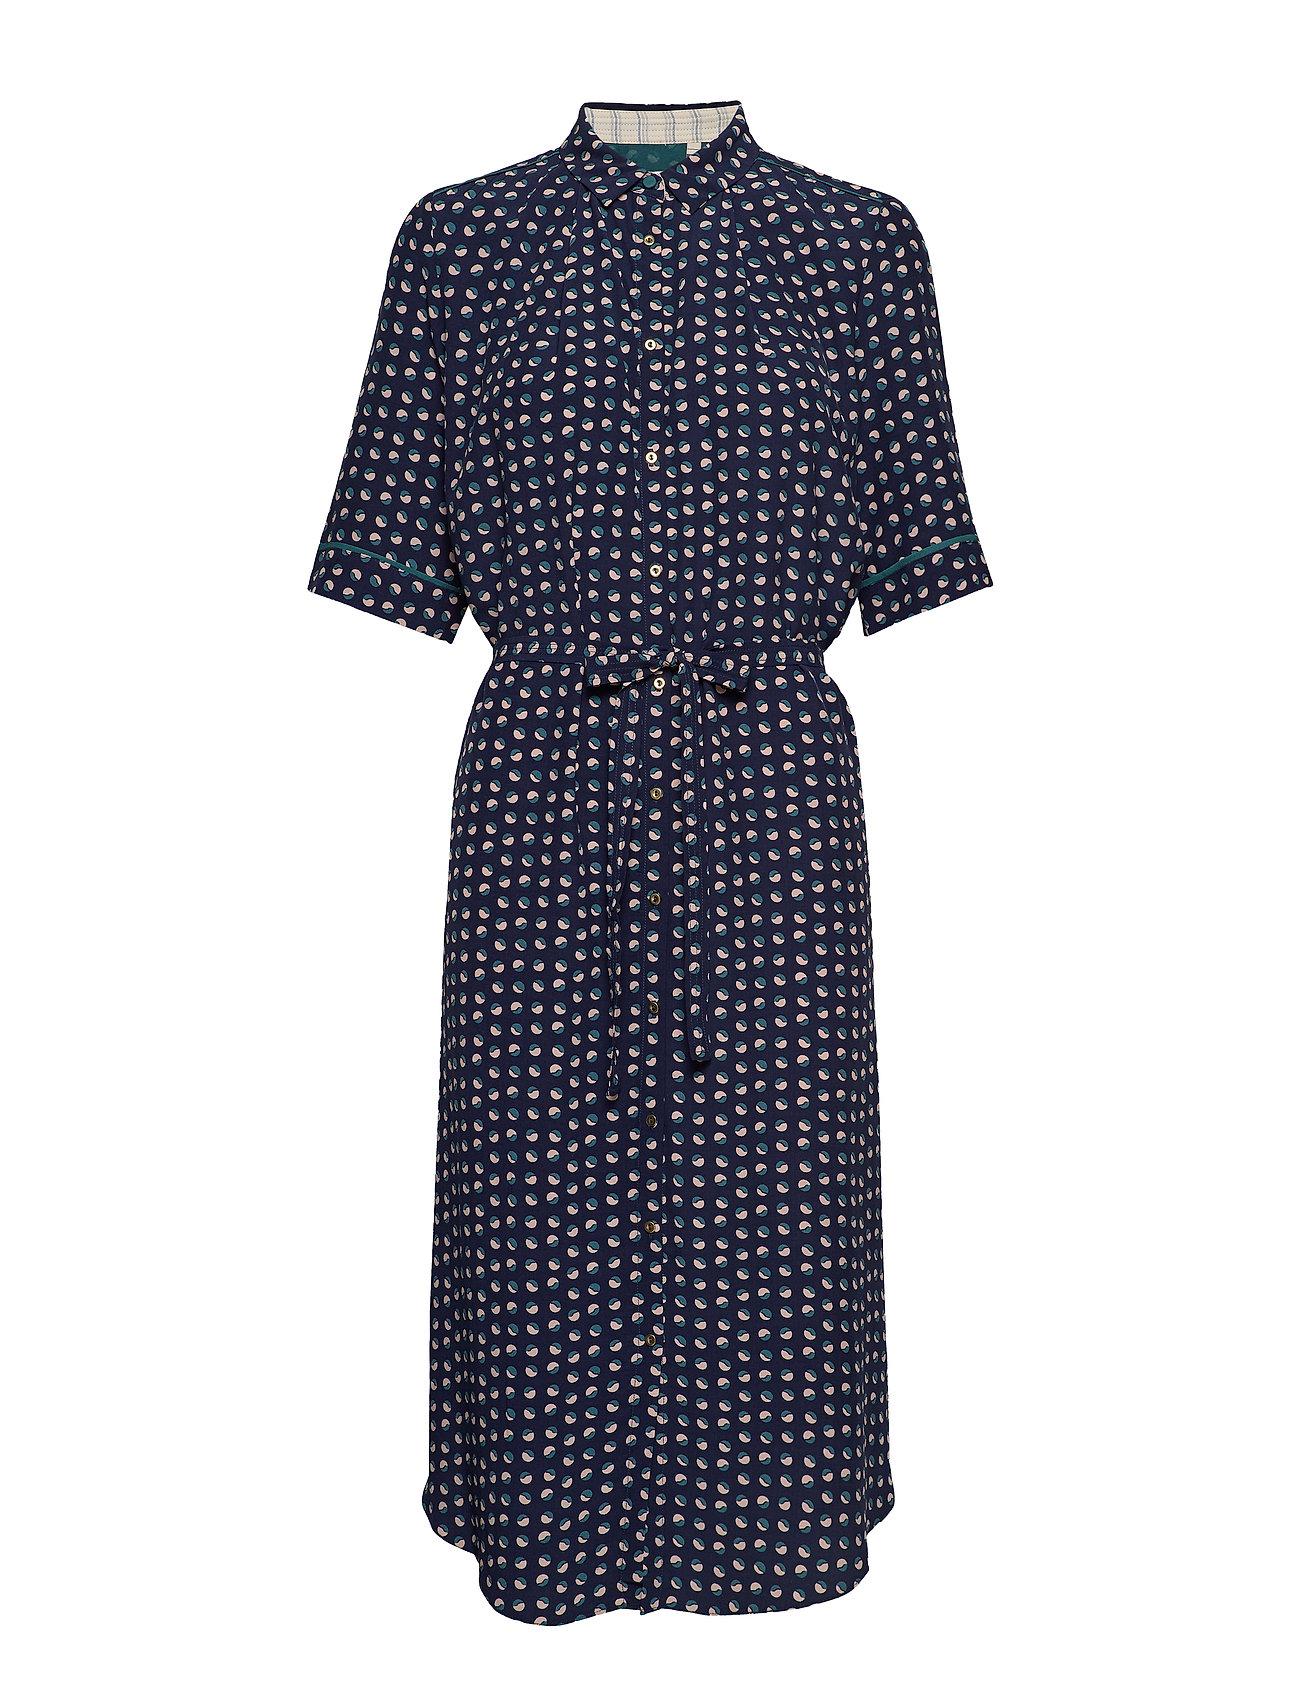 BlueNoa Dress Sleeveprint BlueNoa Sleeveprint BlueNoa Short Sleeveprint Dress Short Short Dress PwO8nX0k